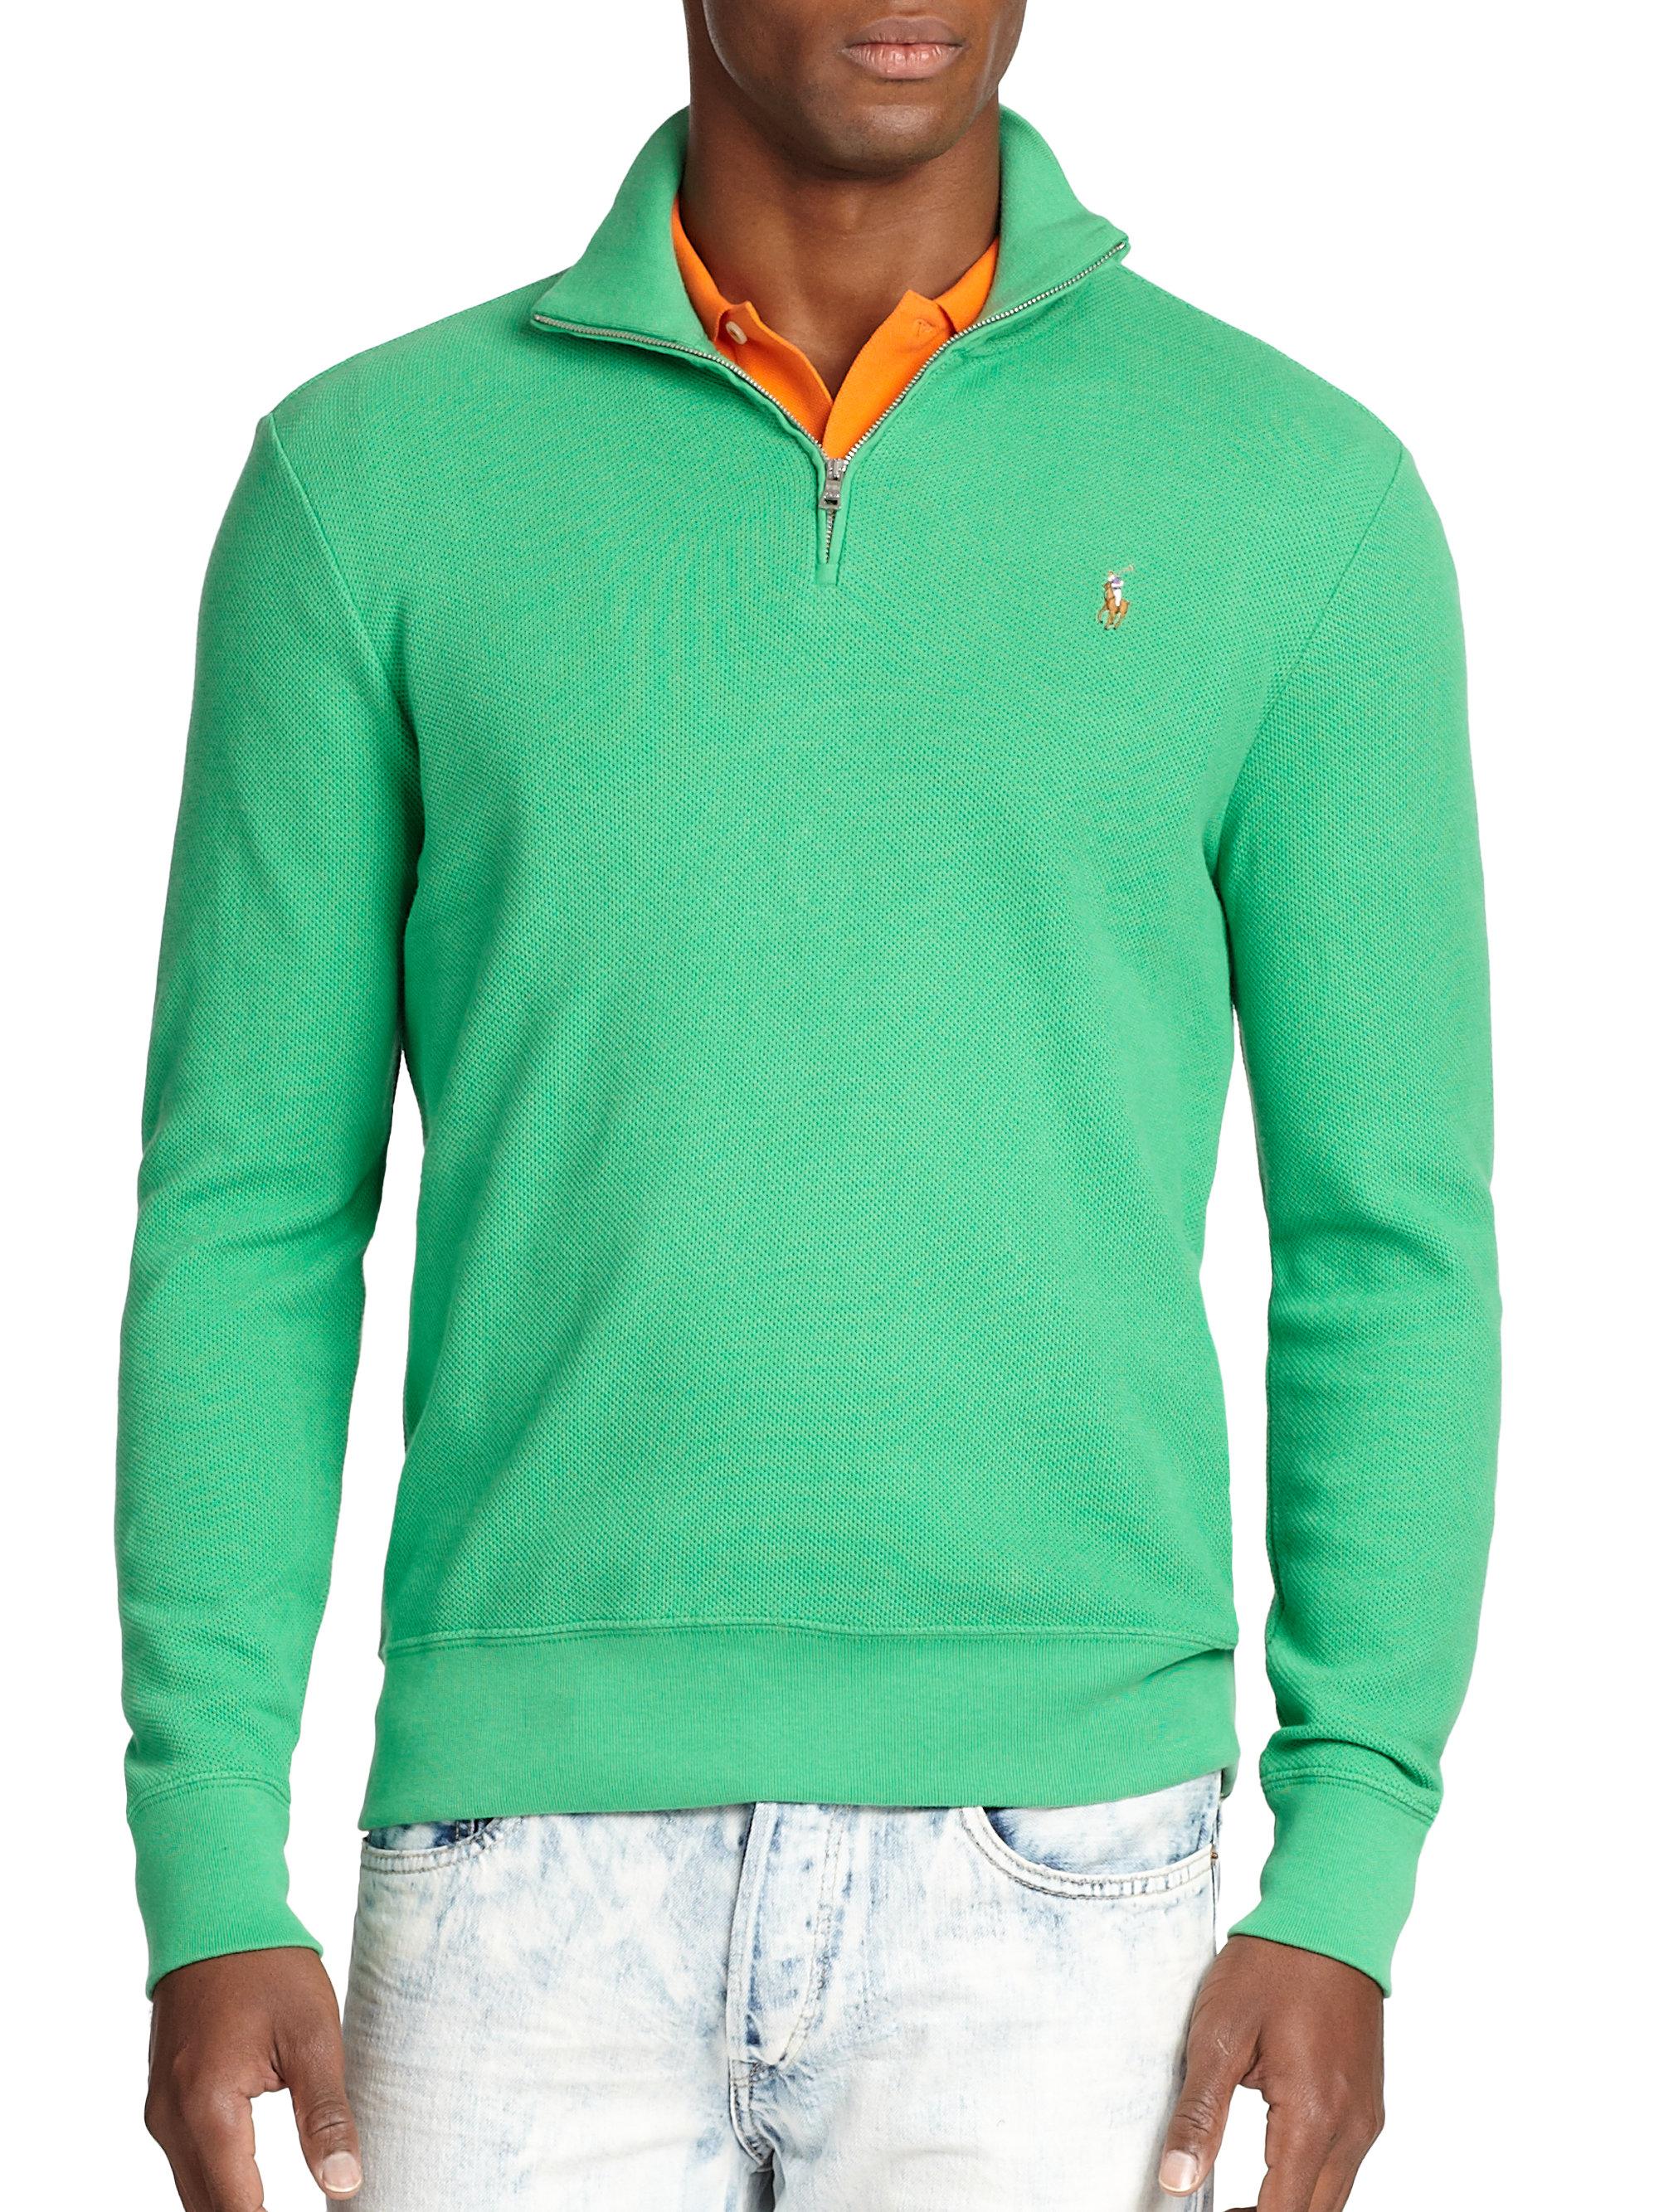 polo ralph lauren pima half zip pullover in green for men. Black Bedroom Furniture Sets. Home Design Ideas